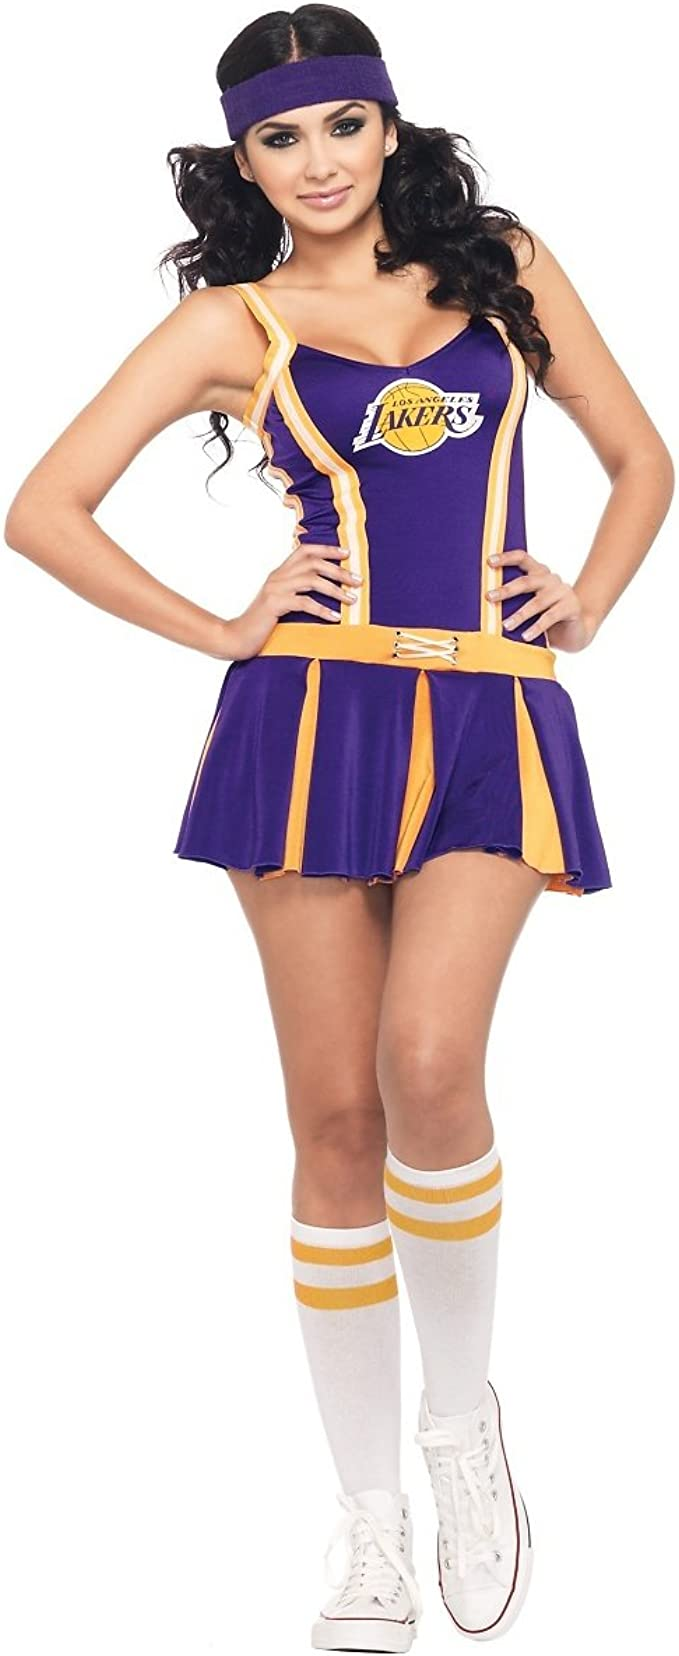 Girls Cheerleader Costume School Girl NBA Basketball Player Fancy Dress